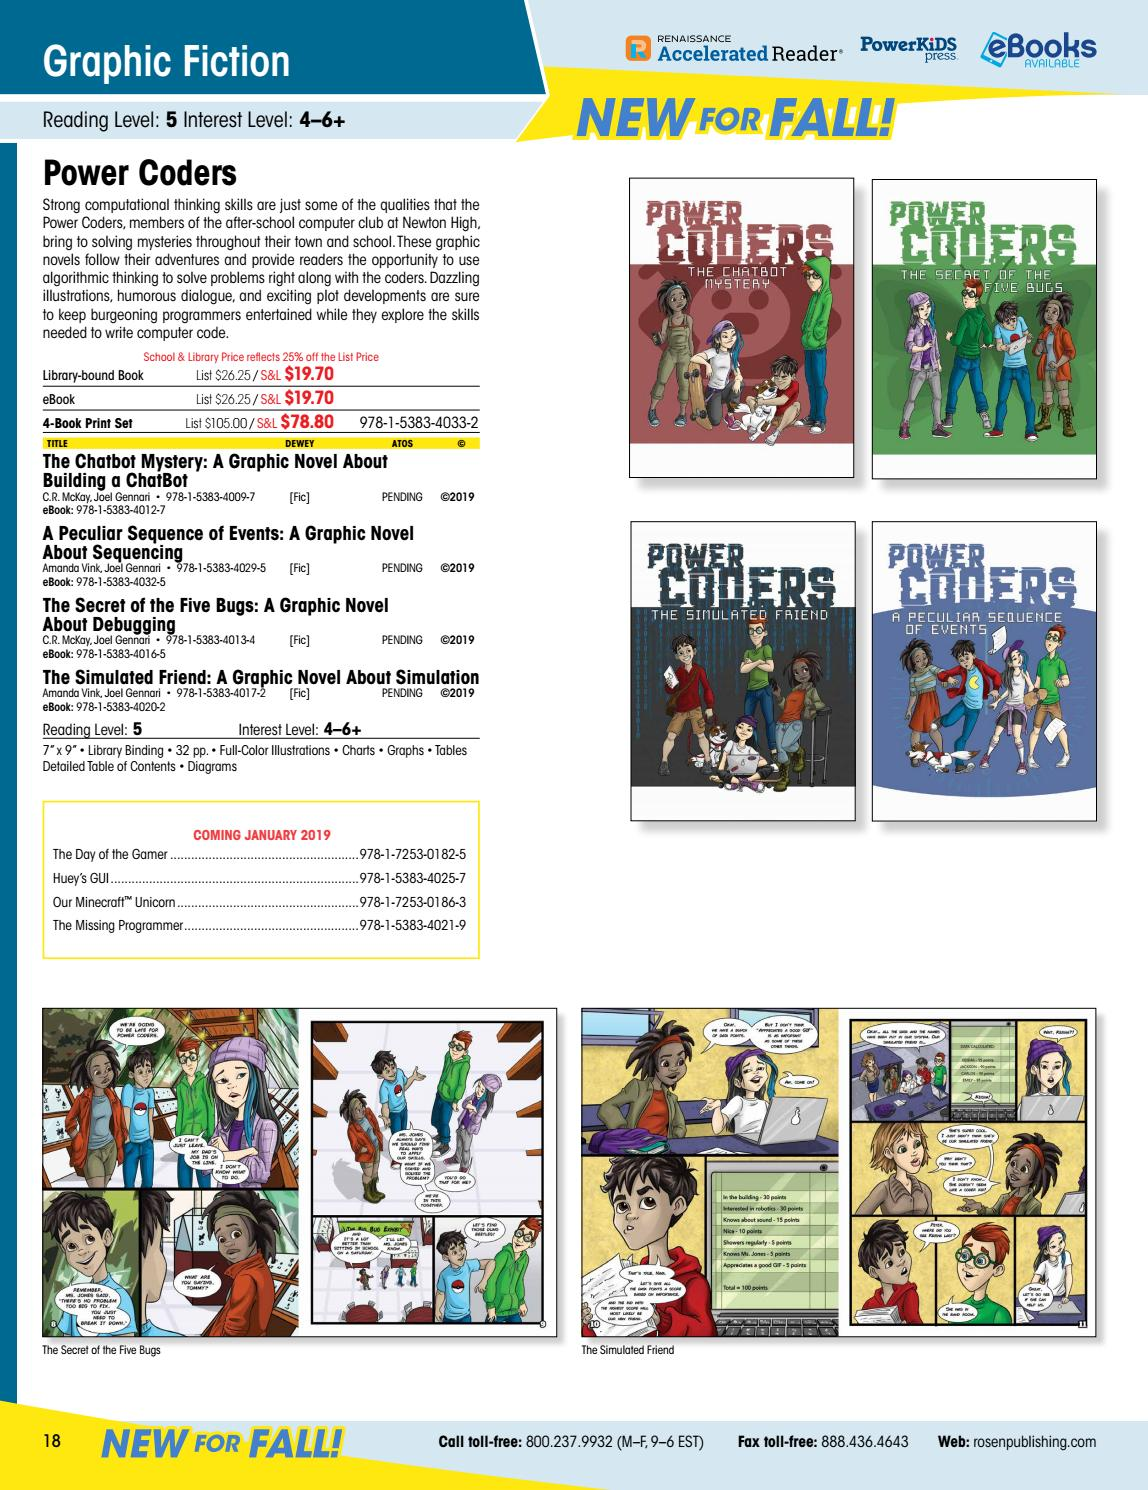 PowerKids Press 2019 Full Catalog by Rosen Publishing - issuu